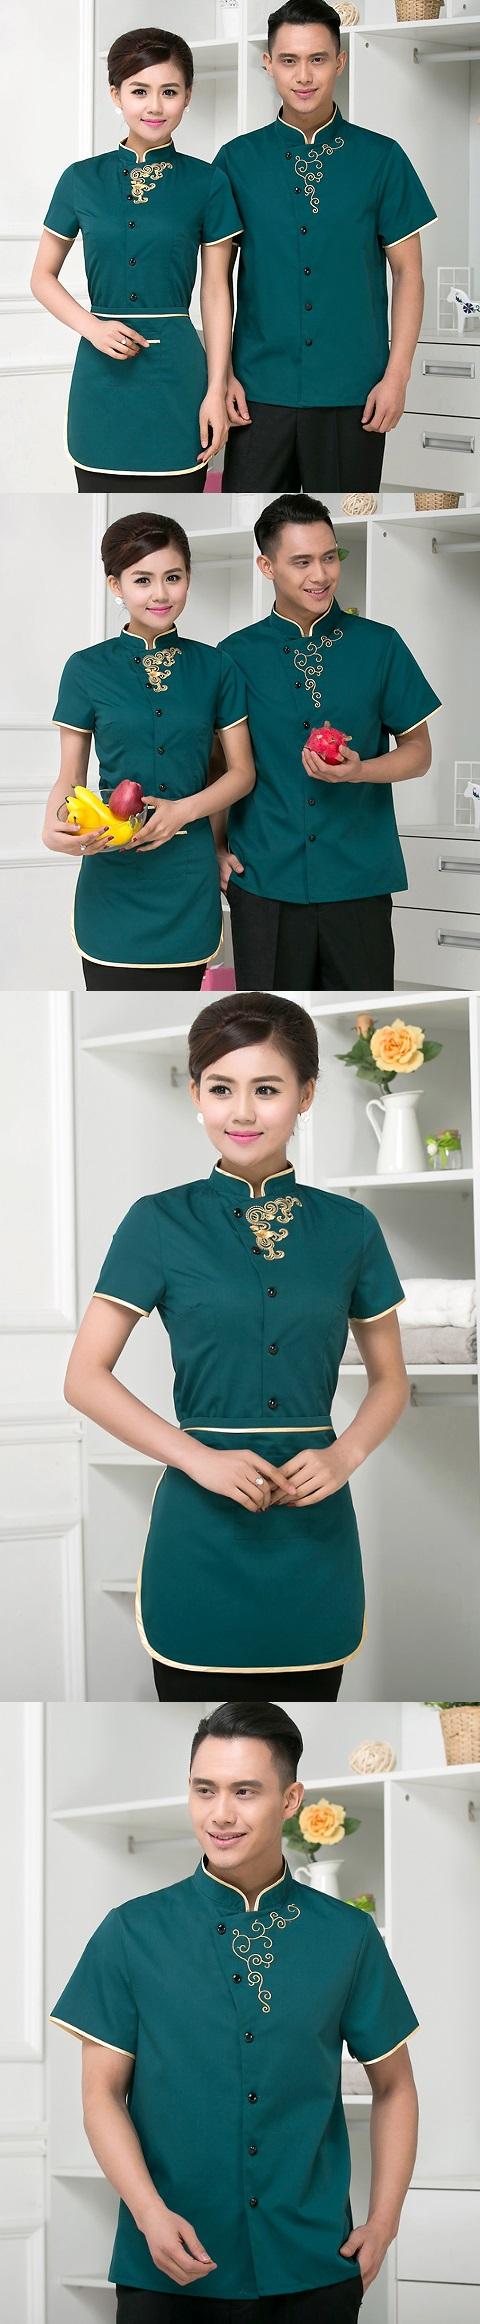 Mandarin Style Restaurant Uniform-Top (Green)